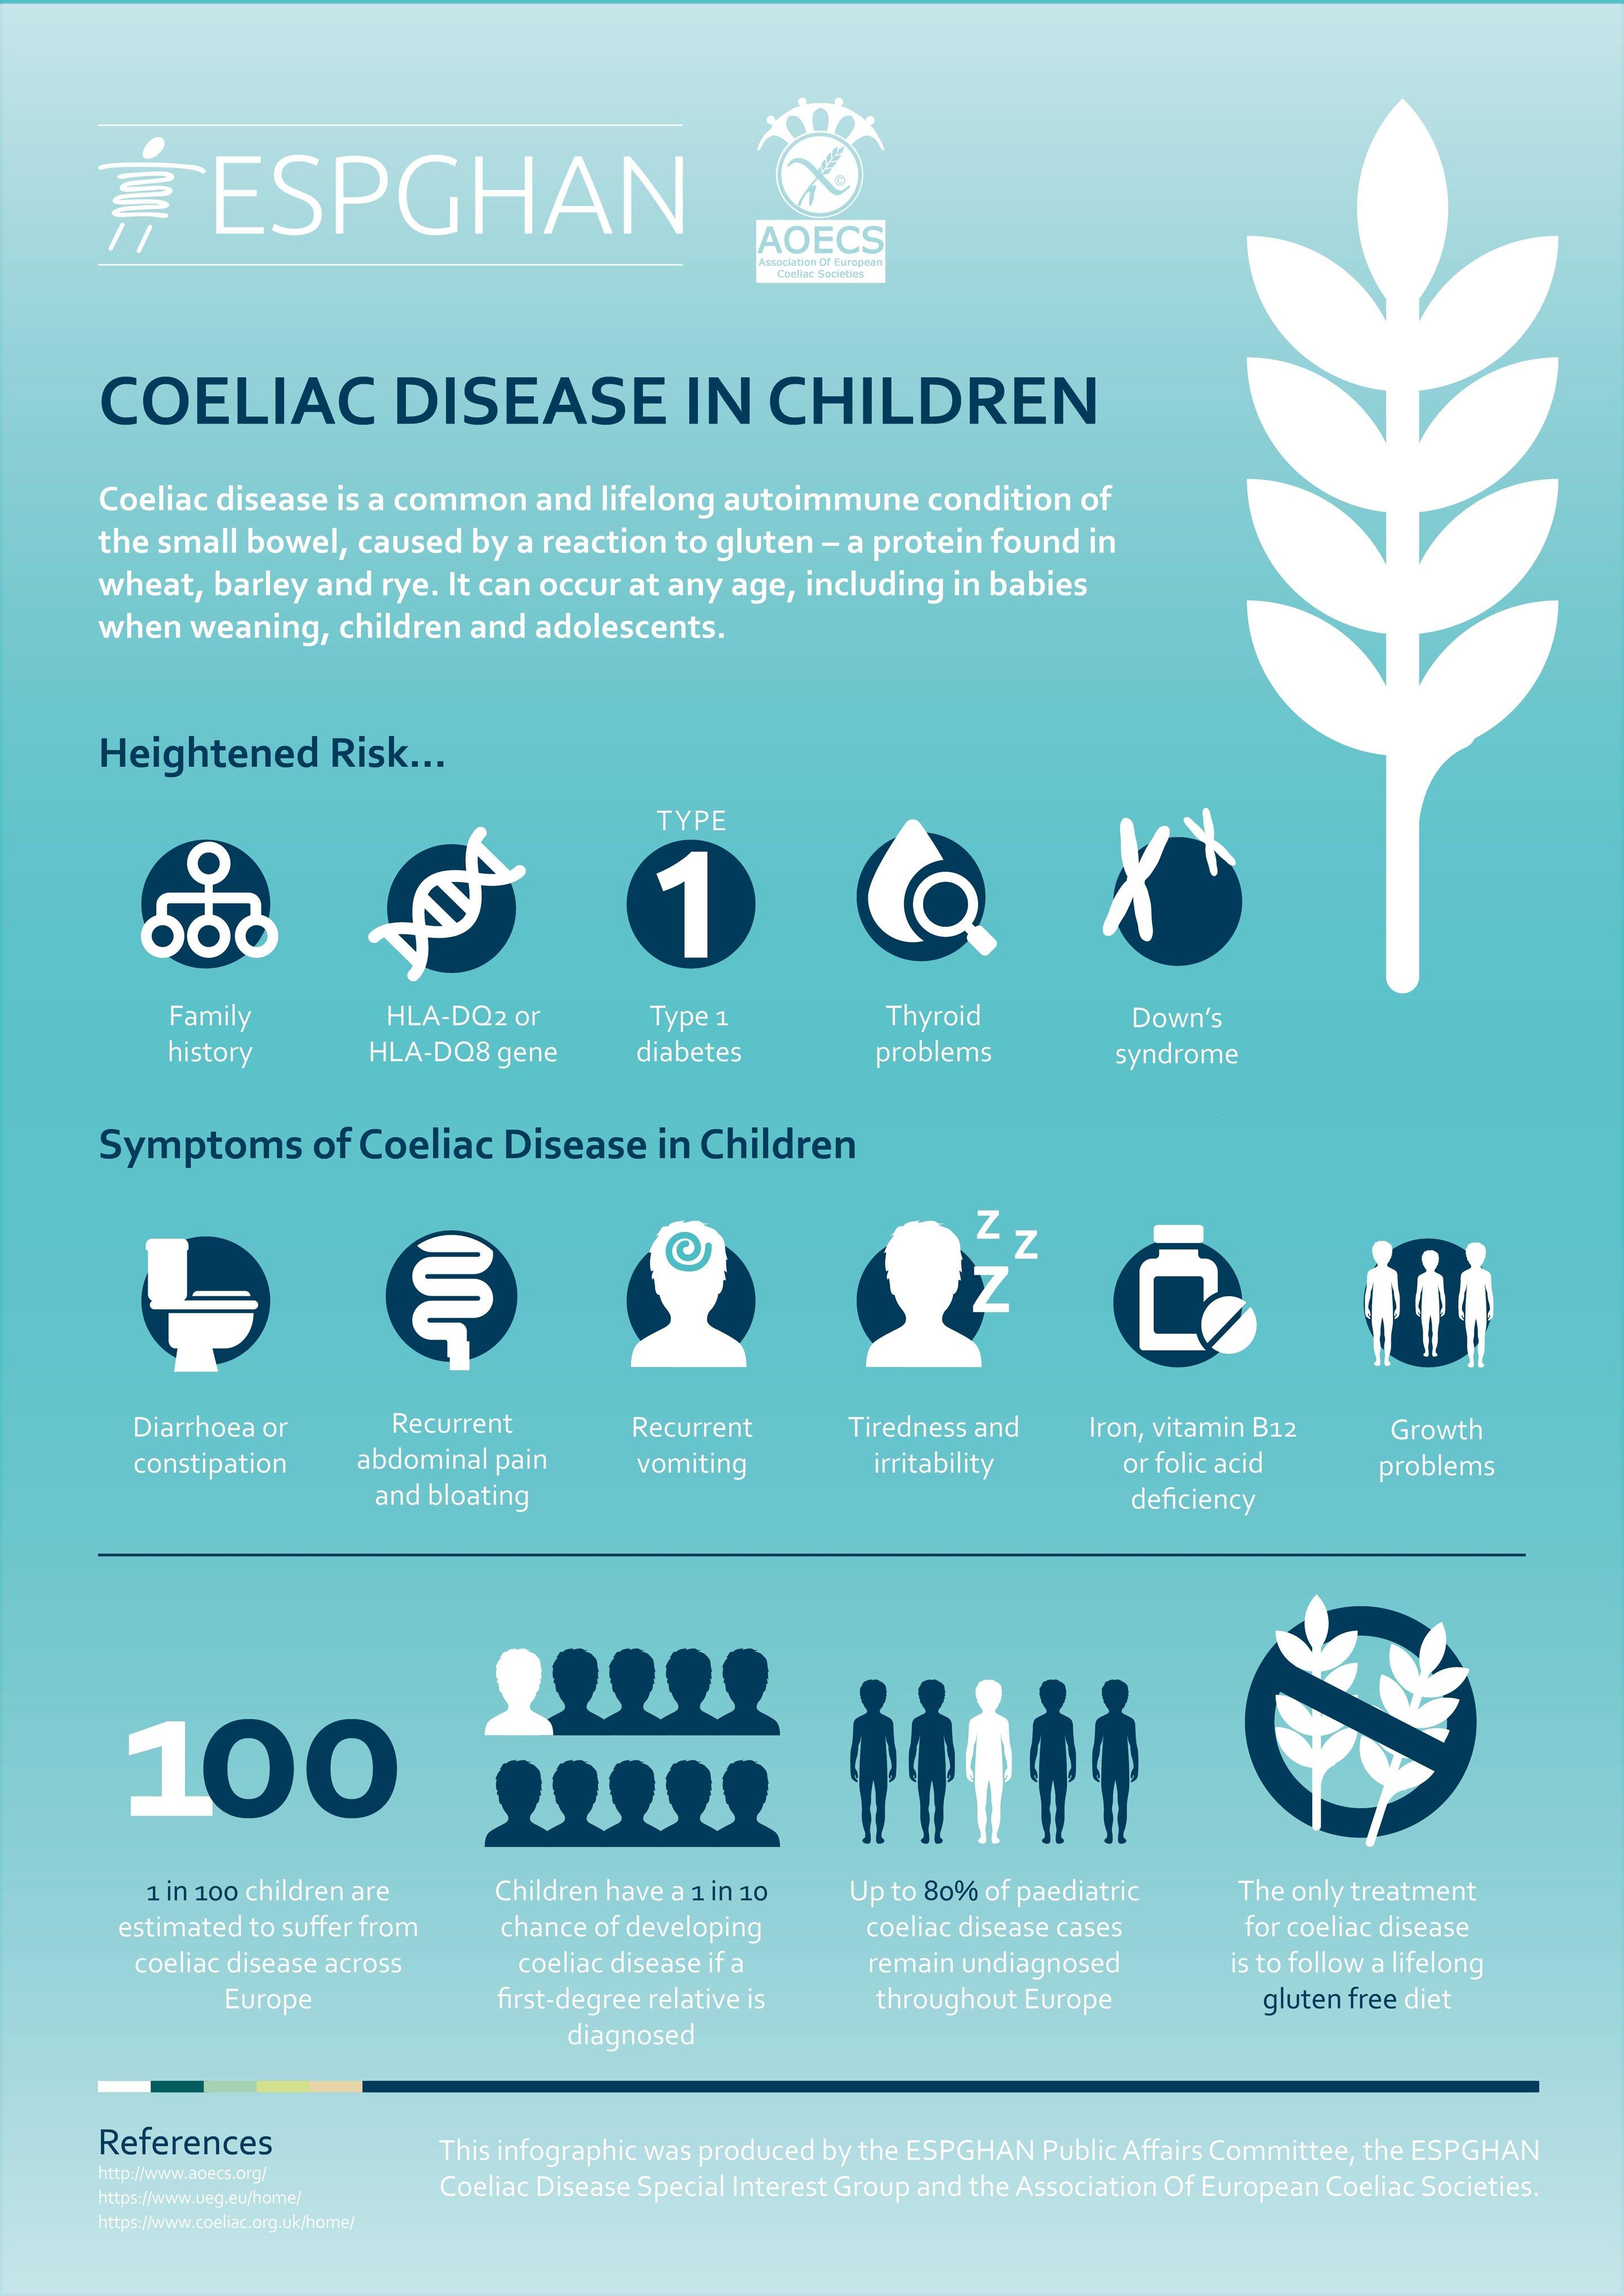 High fiber during pregnancy reduces risk of celiac disease ...